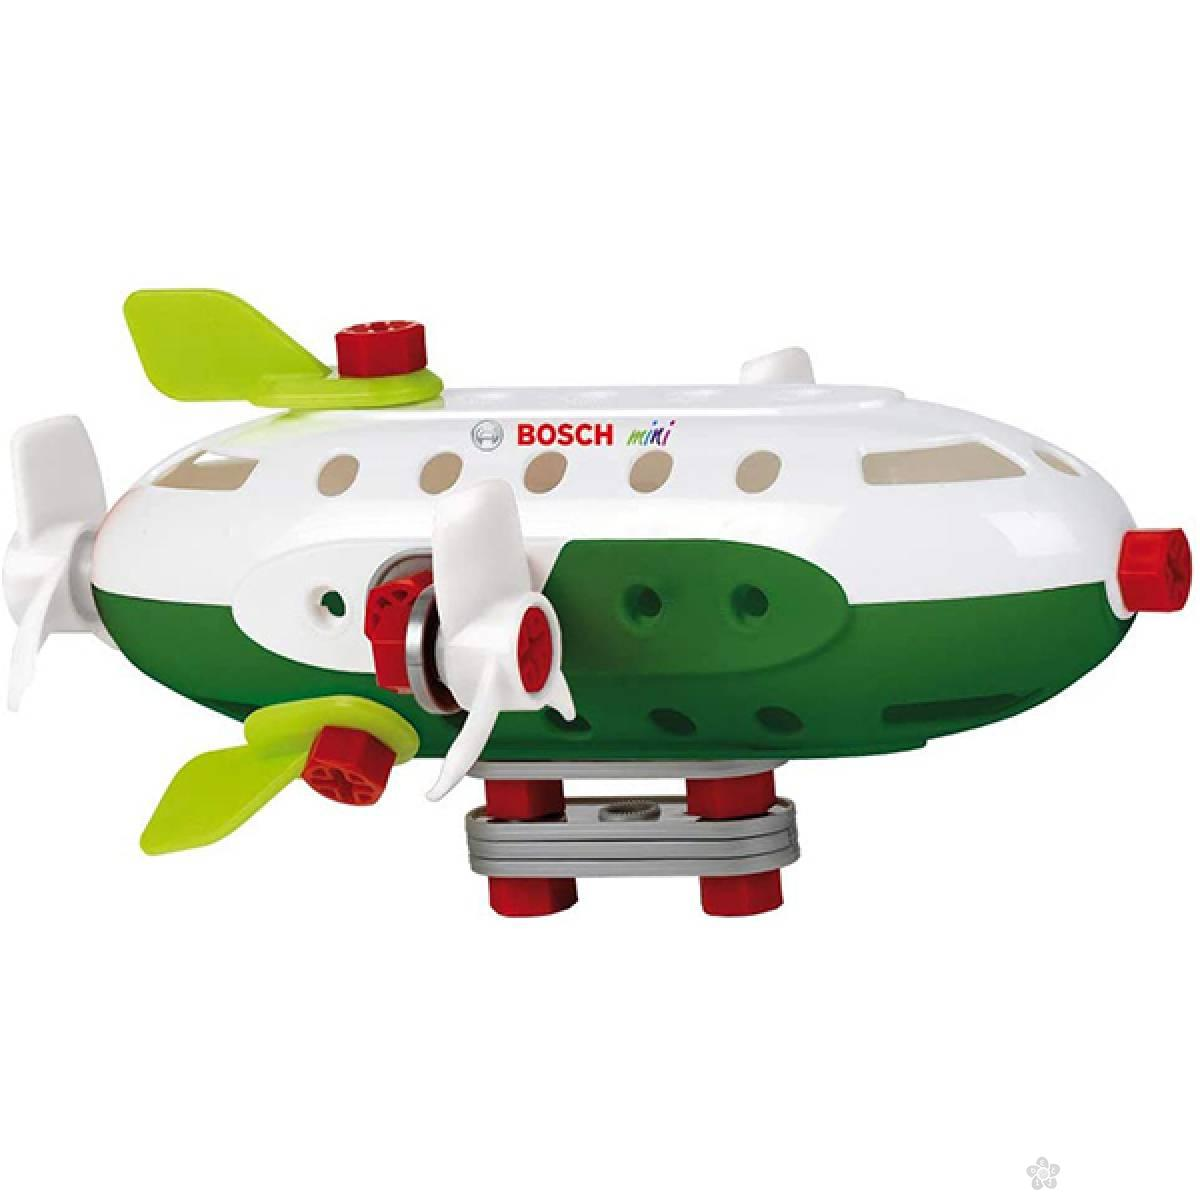 Bosch 3 u 1 AIRCRAFT tim Klein KL8790